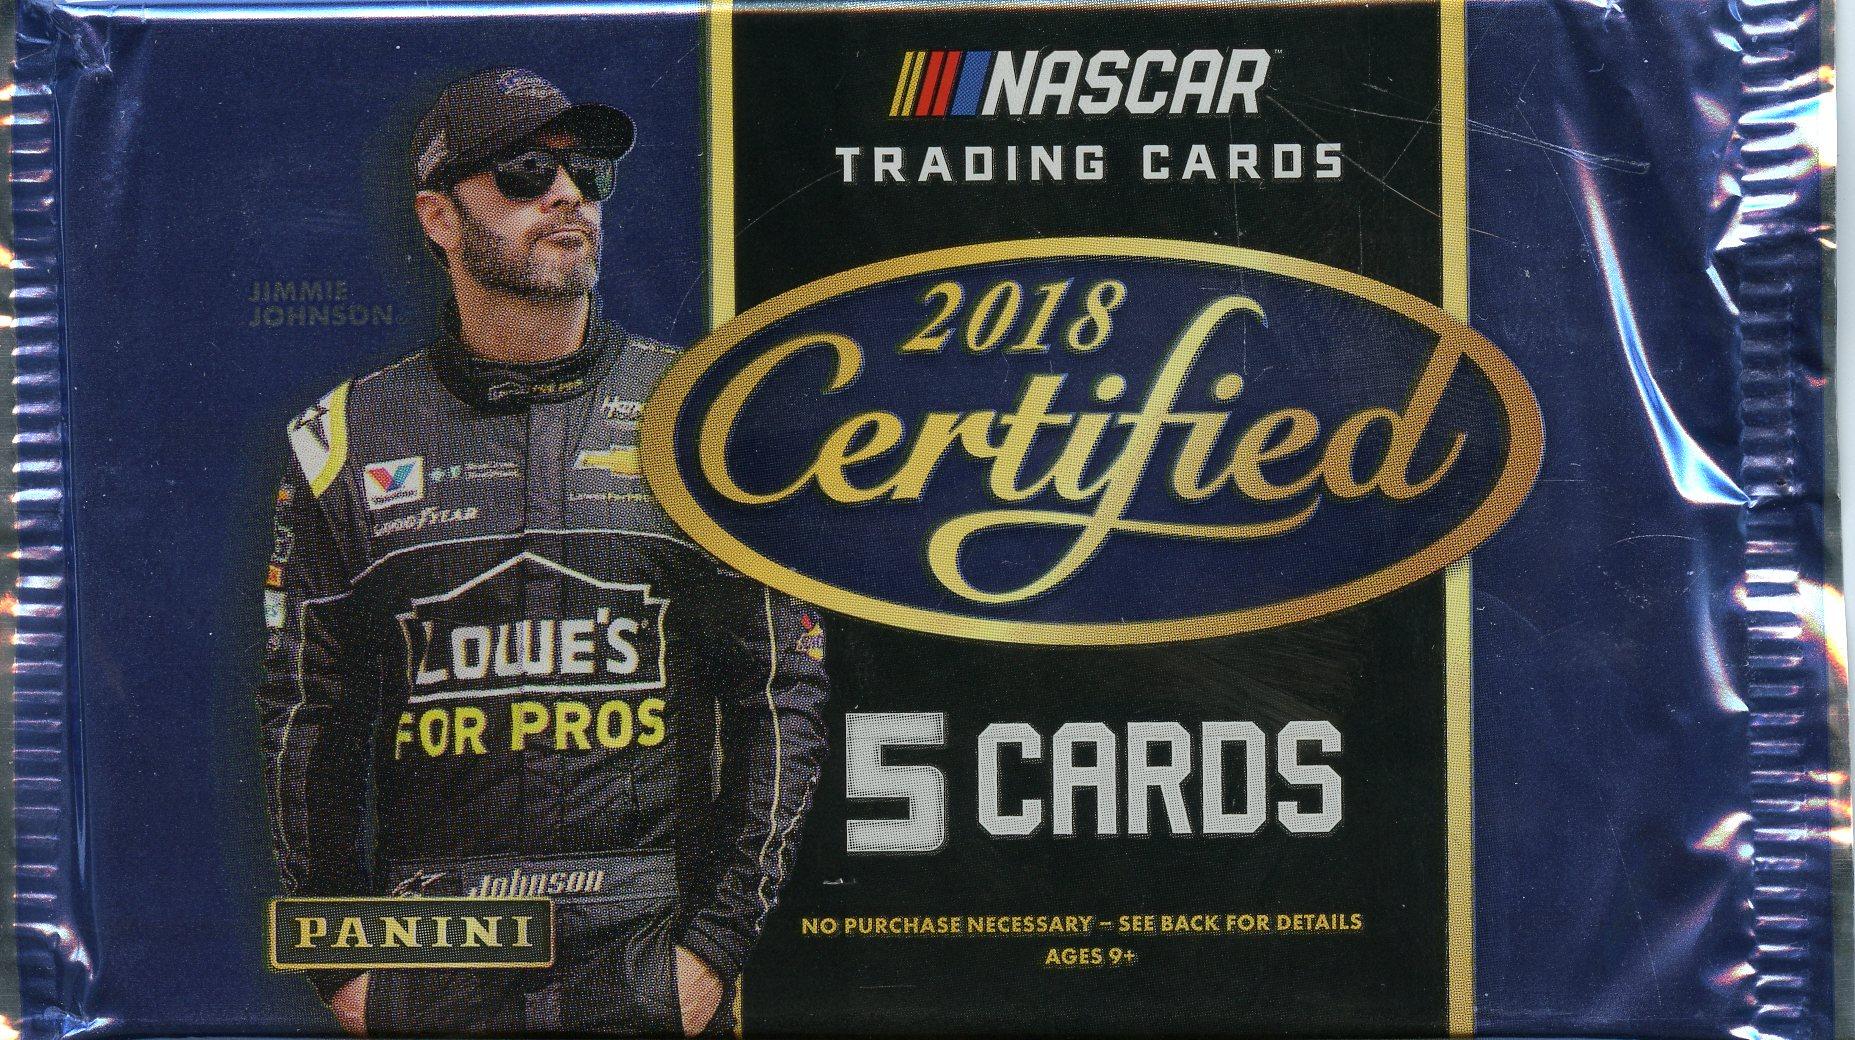 2018 NASCAR -  PANINI CERTIFIED (P5/B10)